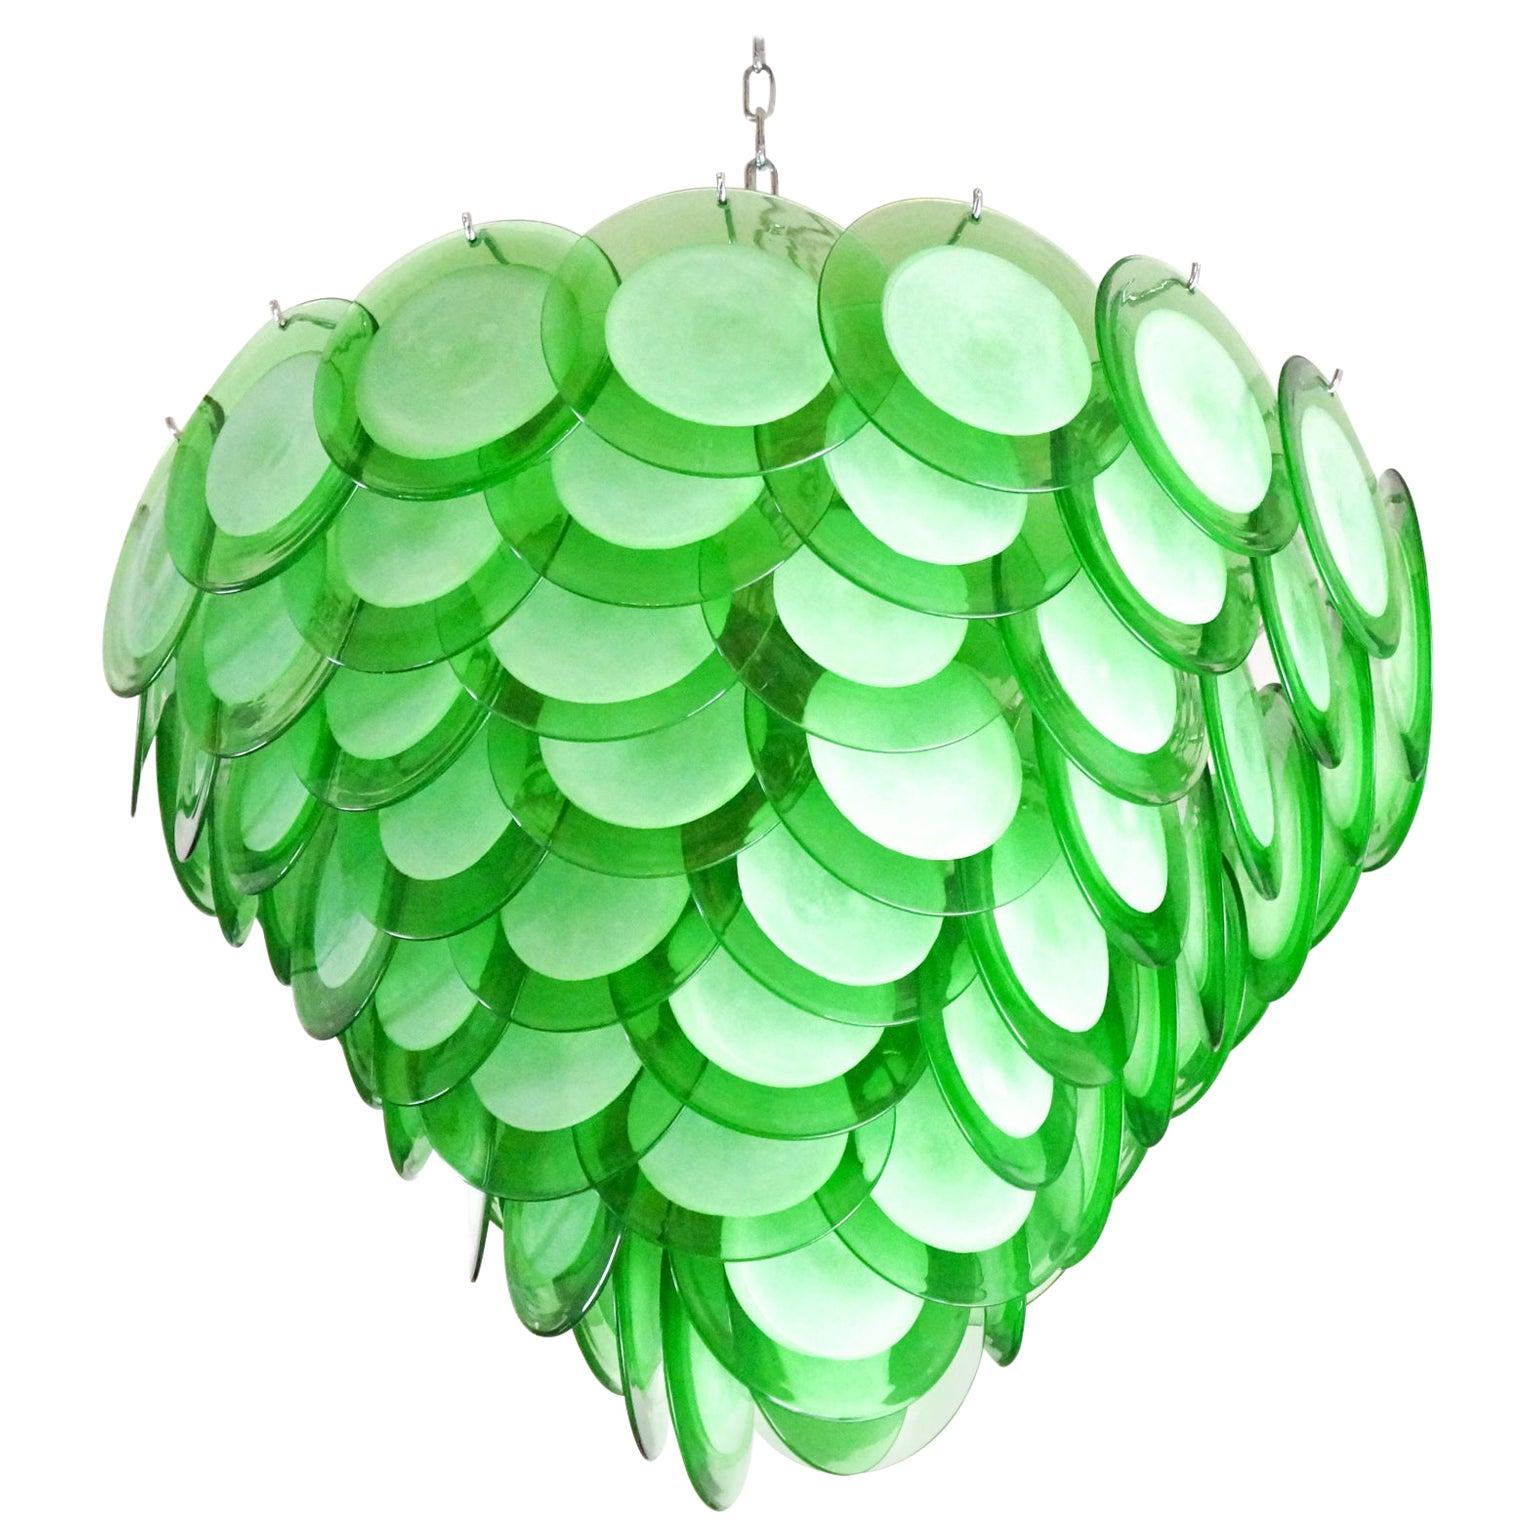 "Vistosi Mid-Century Modern Green Murano Glass Chandelier ""Disks"", 1972"